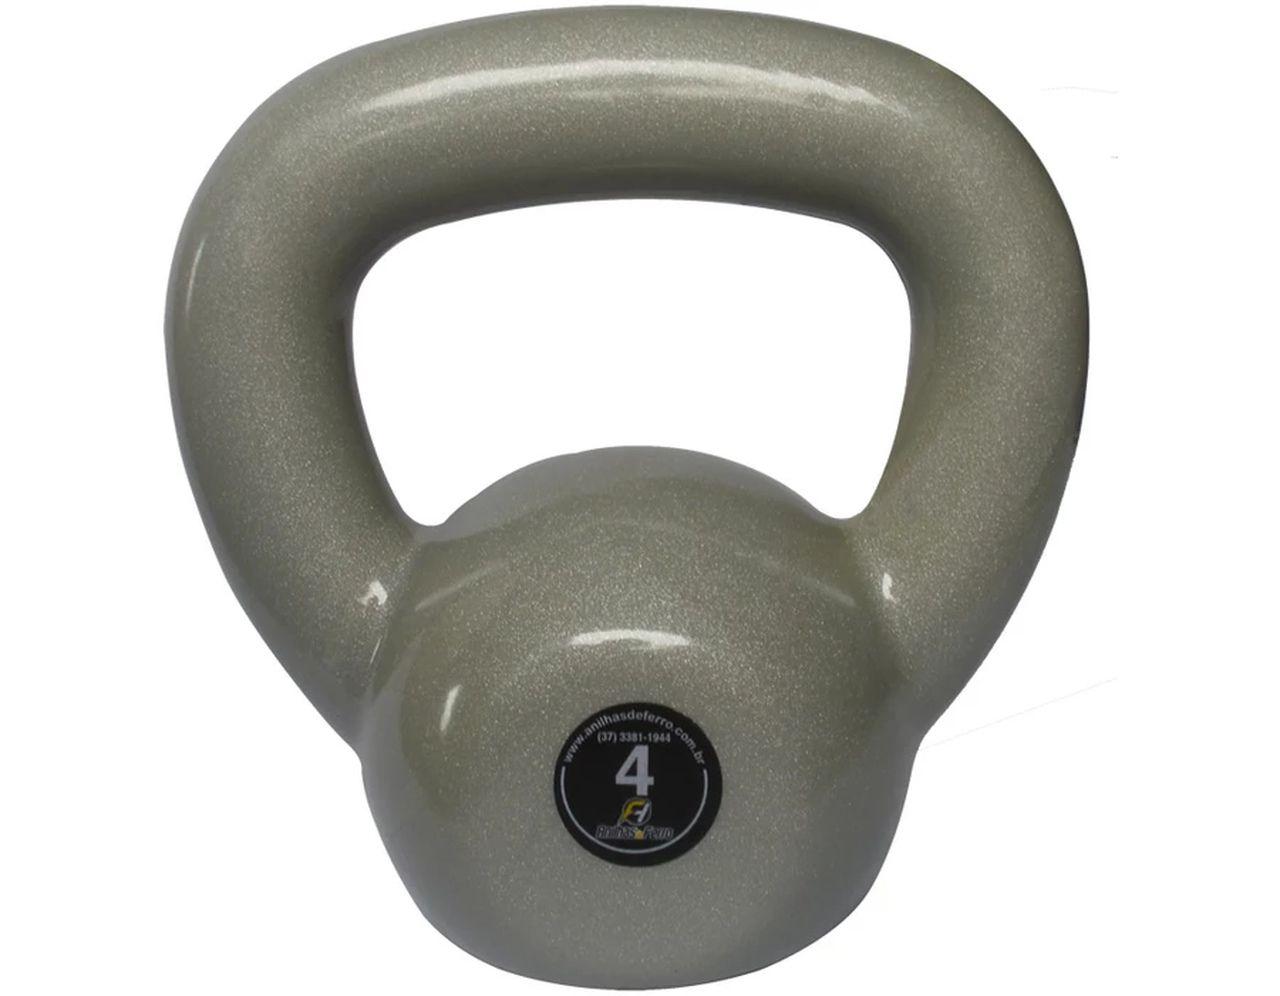 Kettlebell Emborrachado Treinamento Funcional Fitness 4,0 Kg